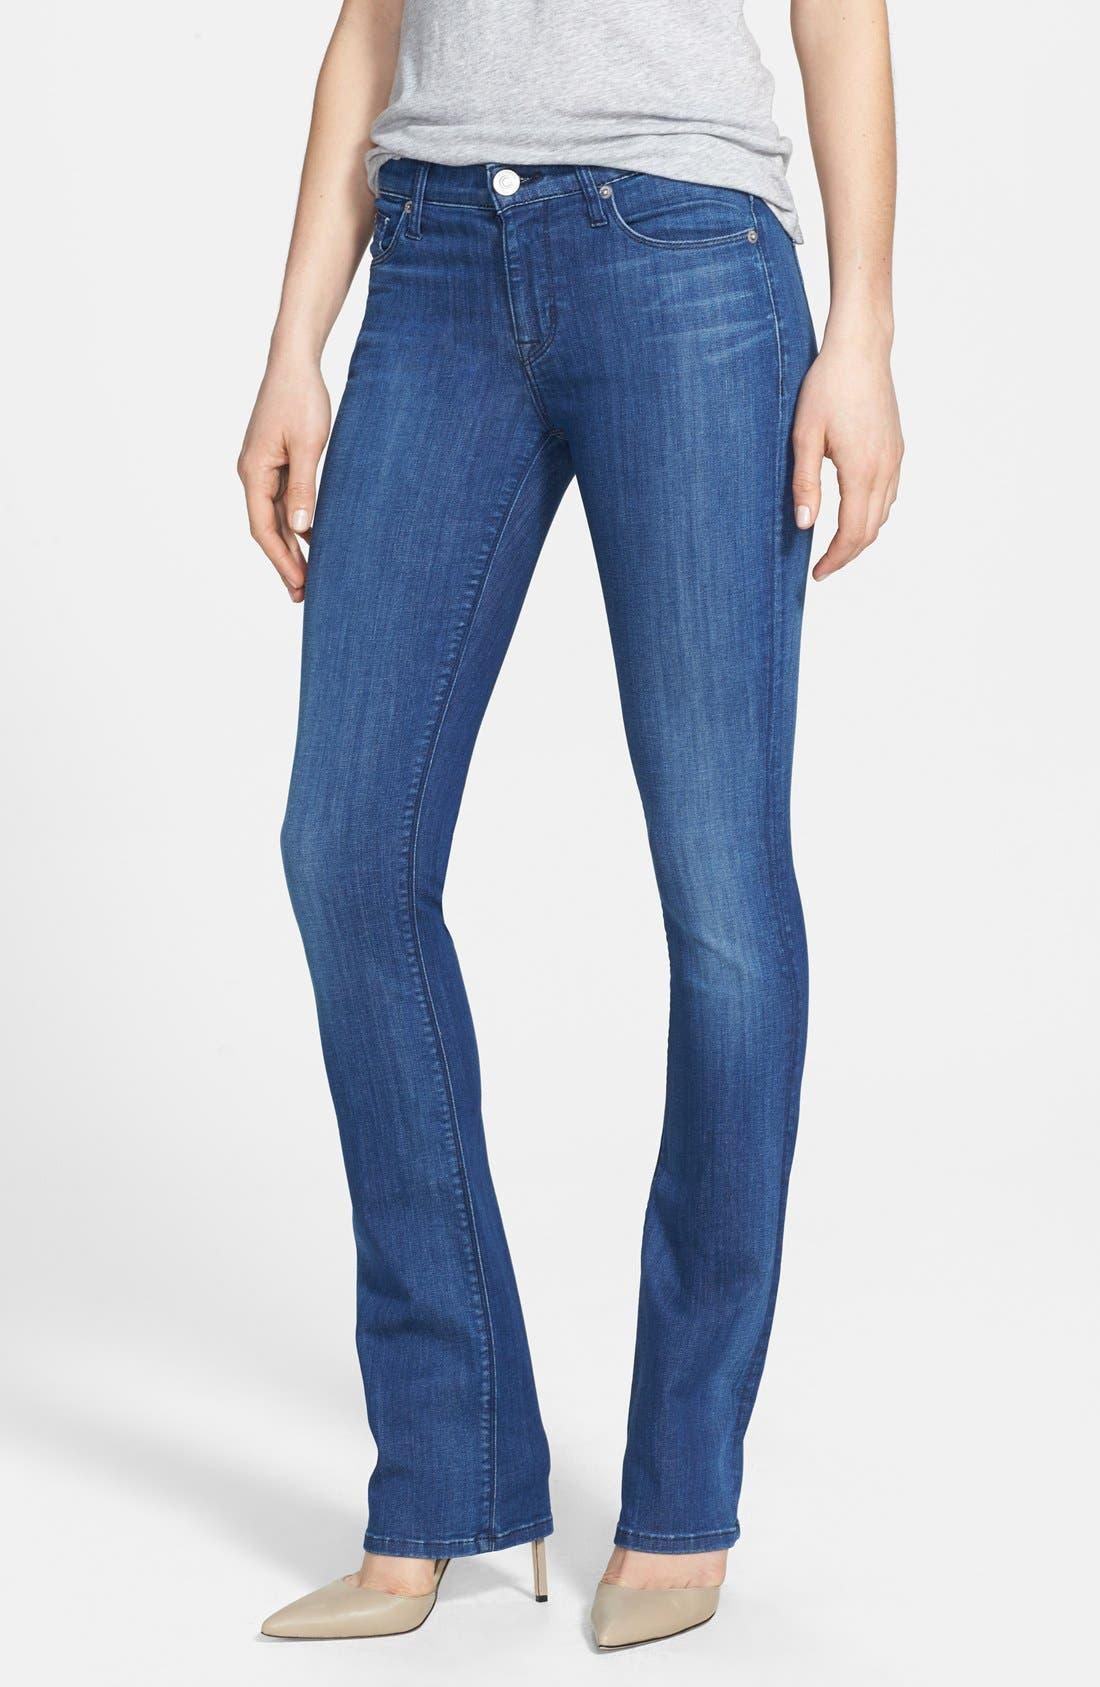 Alternate Image 1 Selected - Hudson Jeans 'Elle' Baby Bootcut Jeans